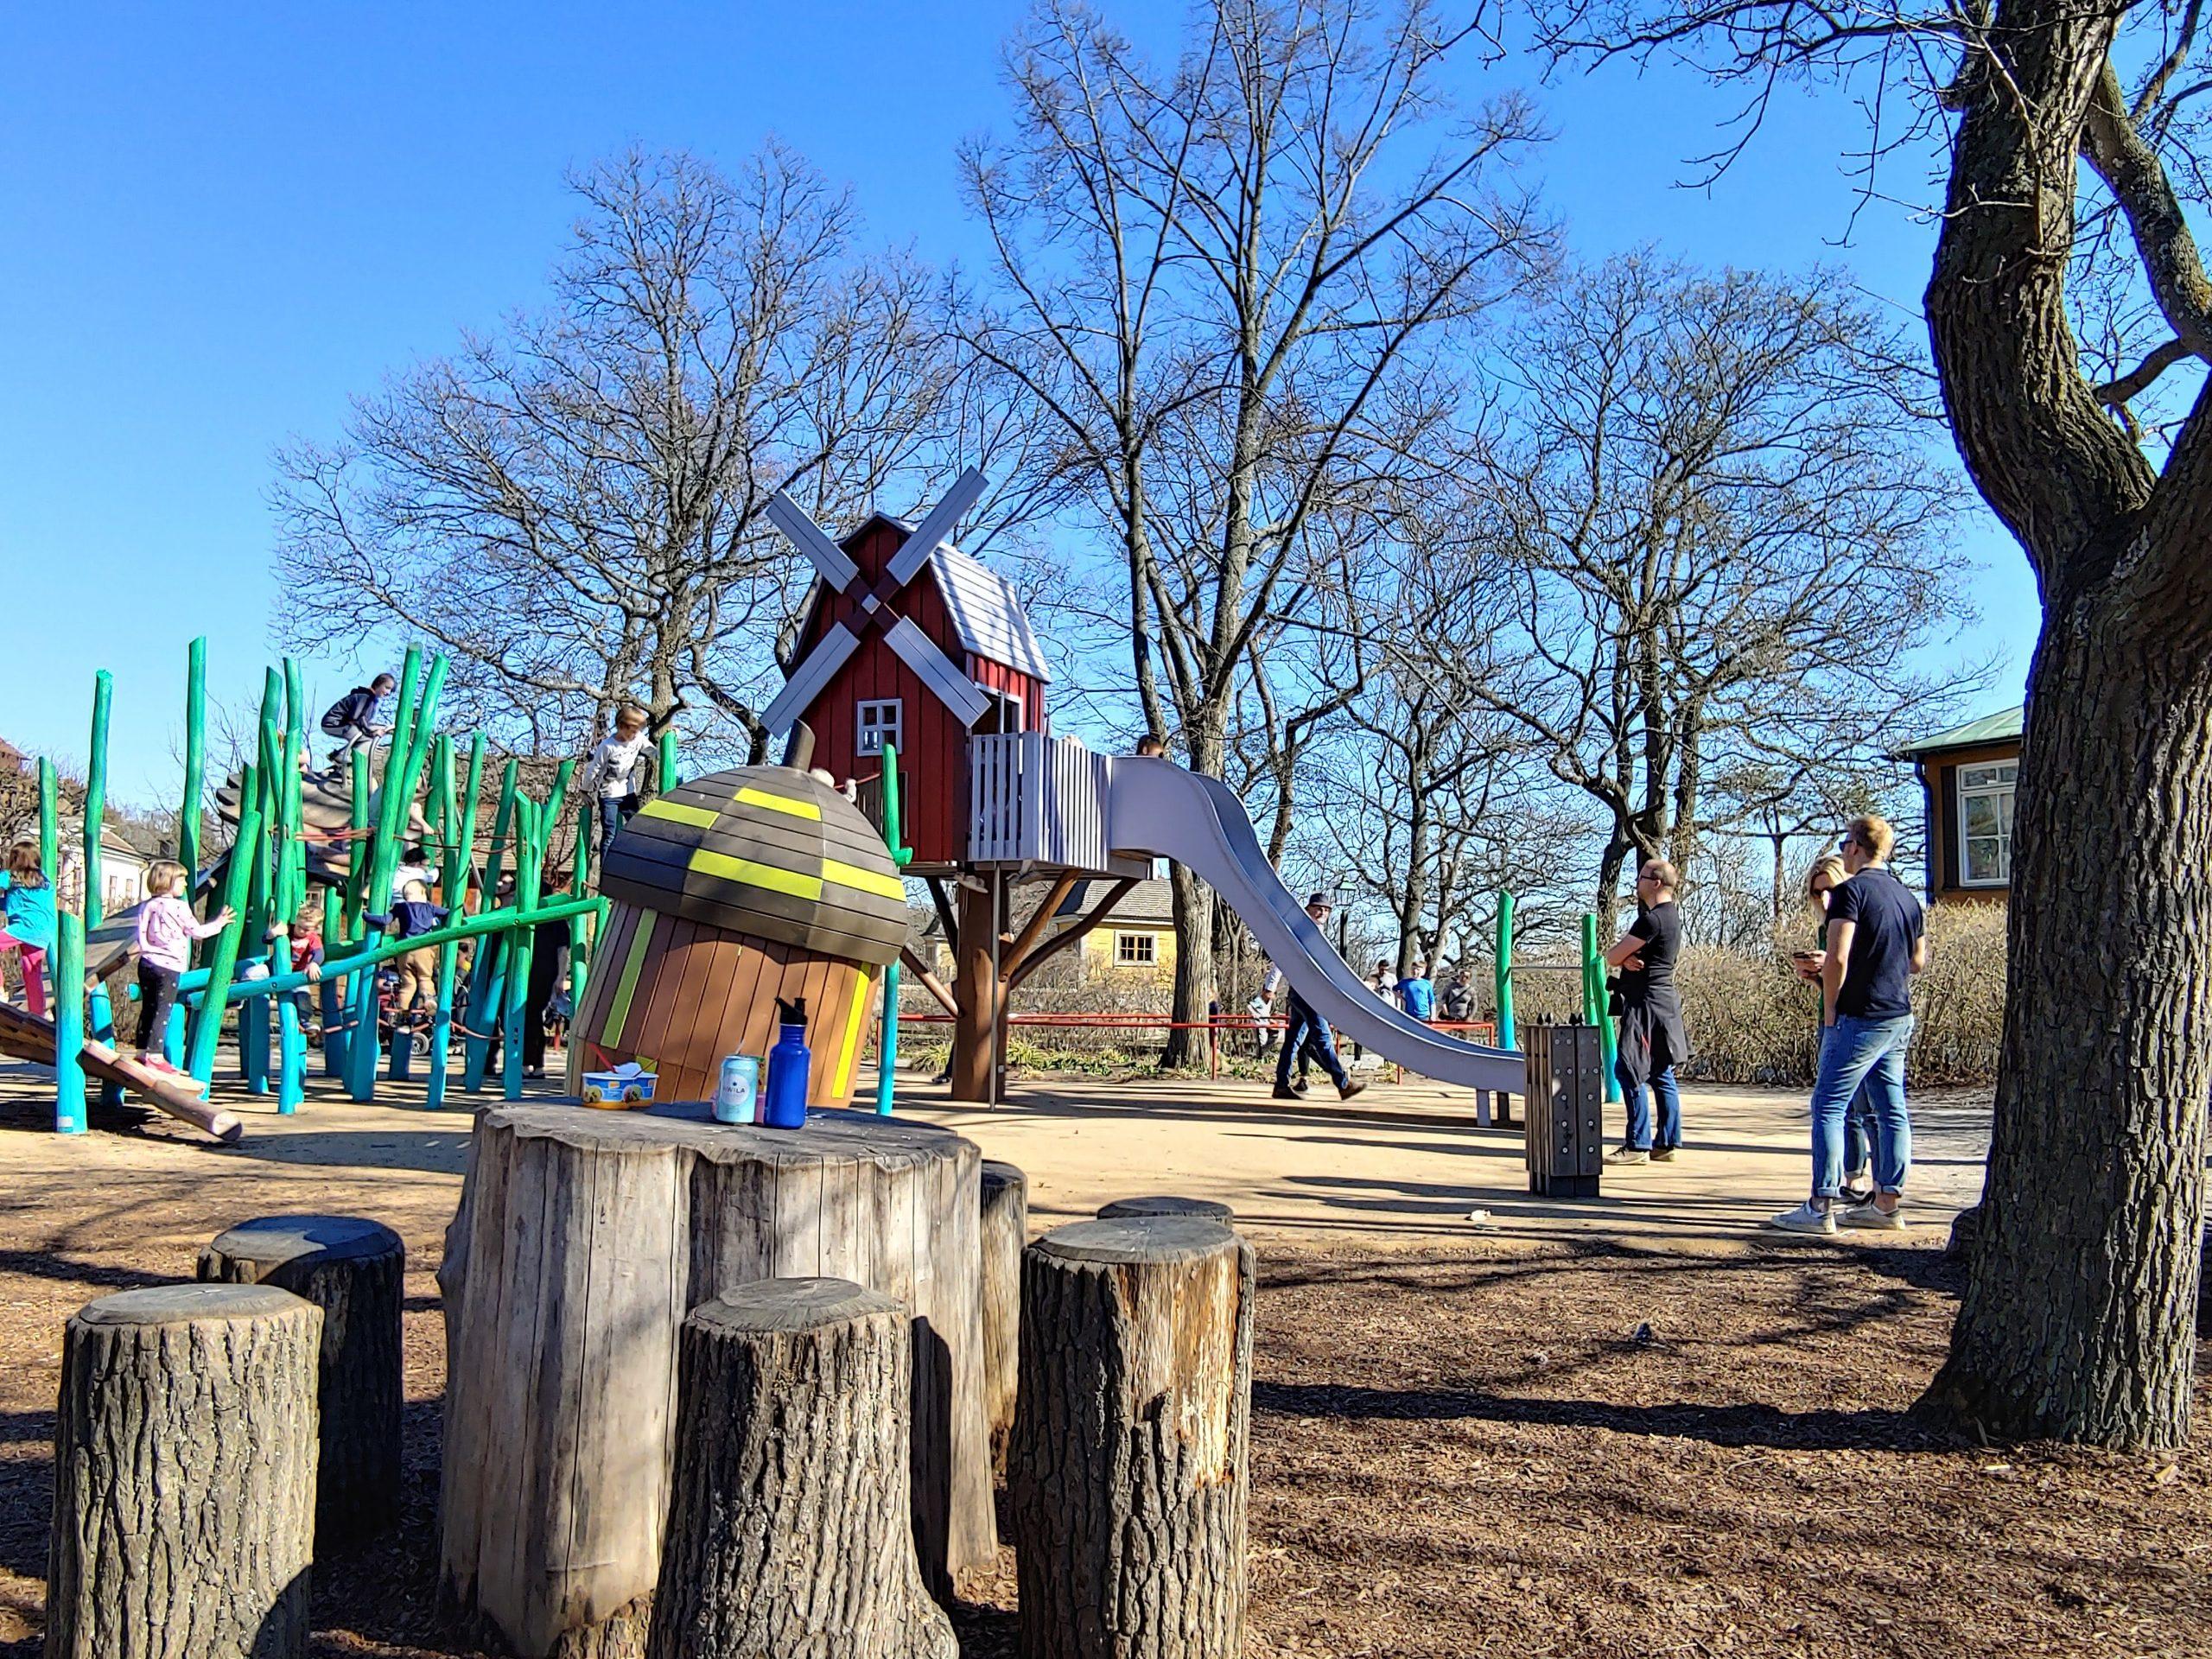 Nearby playground